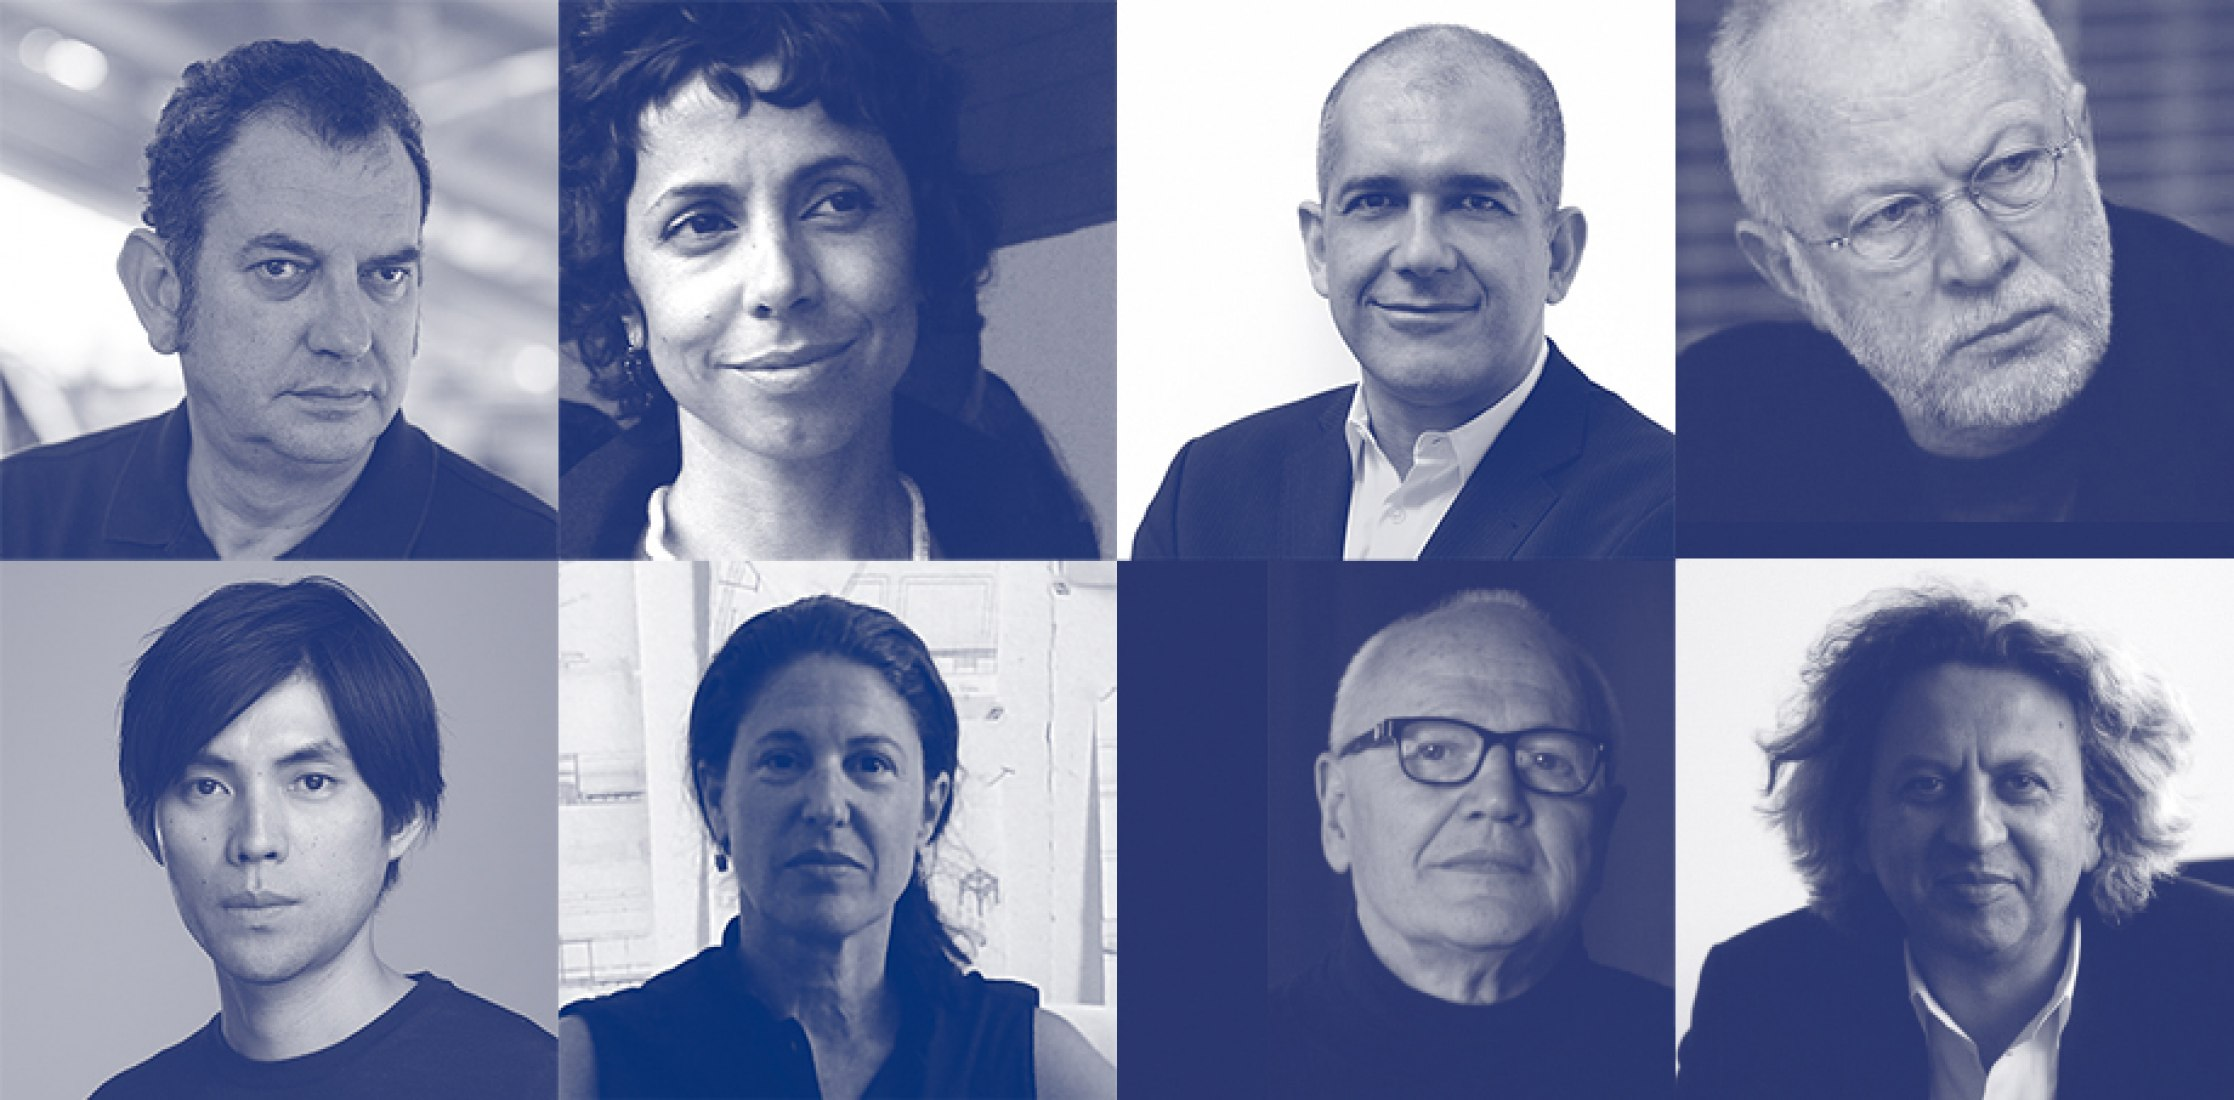 Left to Right. Iñaki Ábalos, Sílvia Benedito, Pedro Gadanho, K. Michael Hays, Shohei Shigematsu, Linda Pollak, Jorge Silvetti and Mohsen Mostafavi.